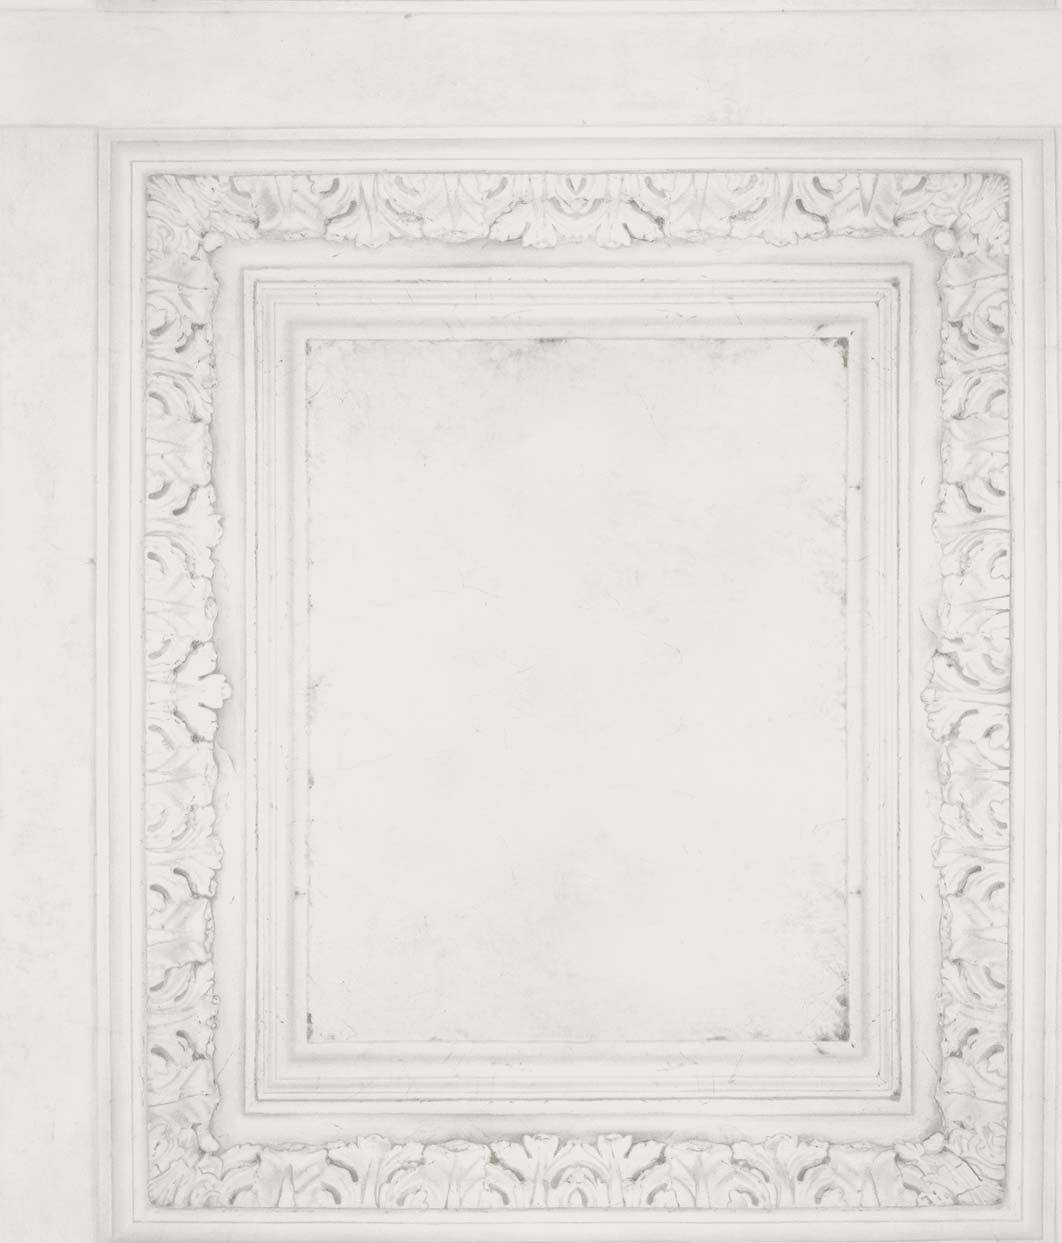 Обои Cole & Son Historic Royal Palaces 98/3013, интернет магазин Волео